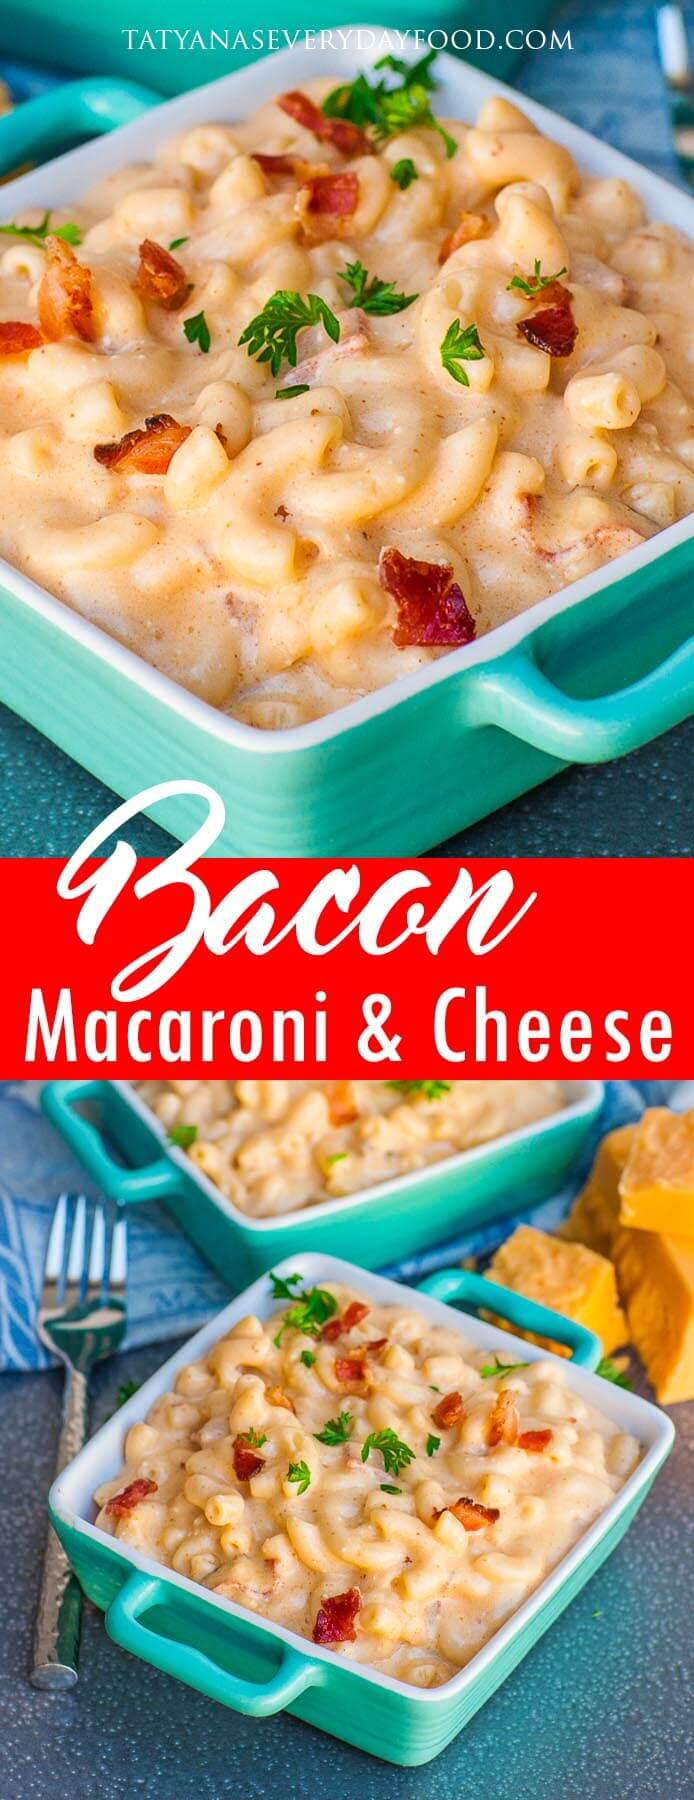 Bacon Macaroni and Cheese video recipe